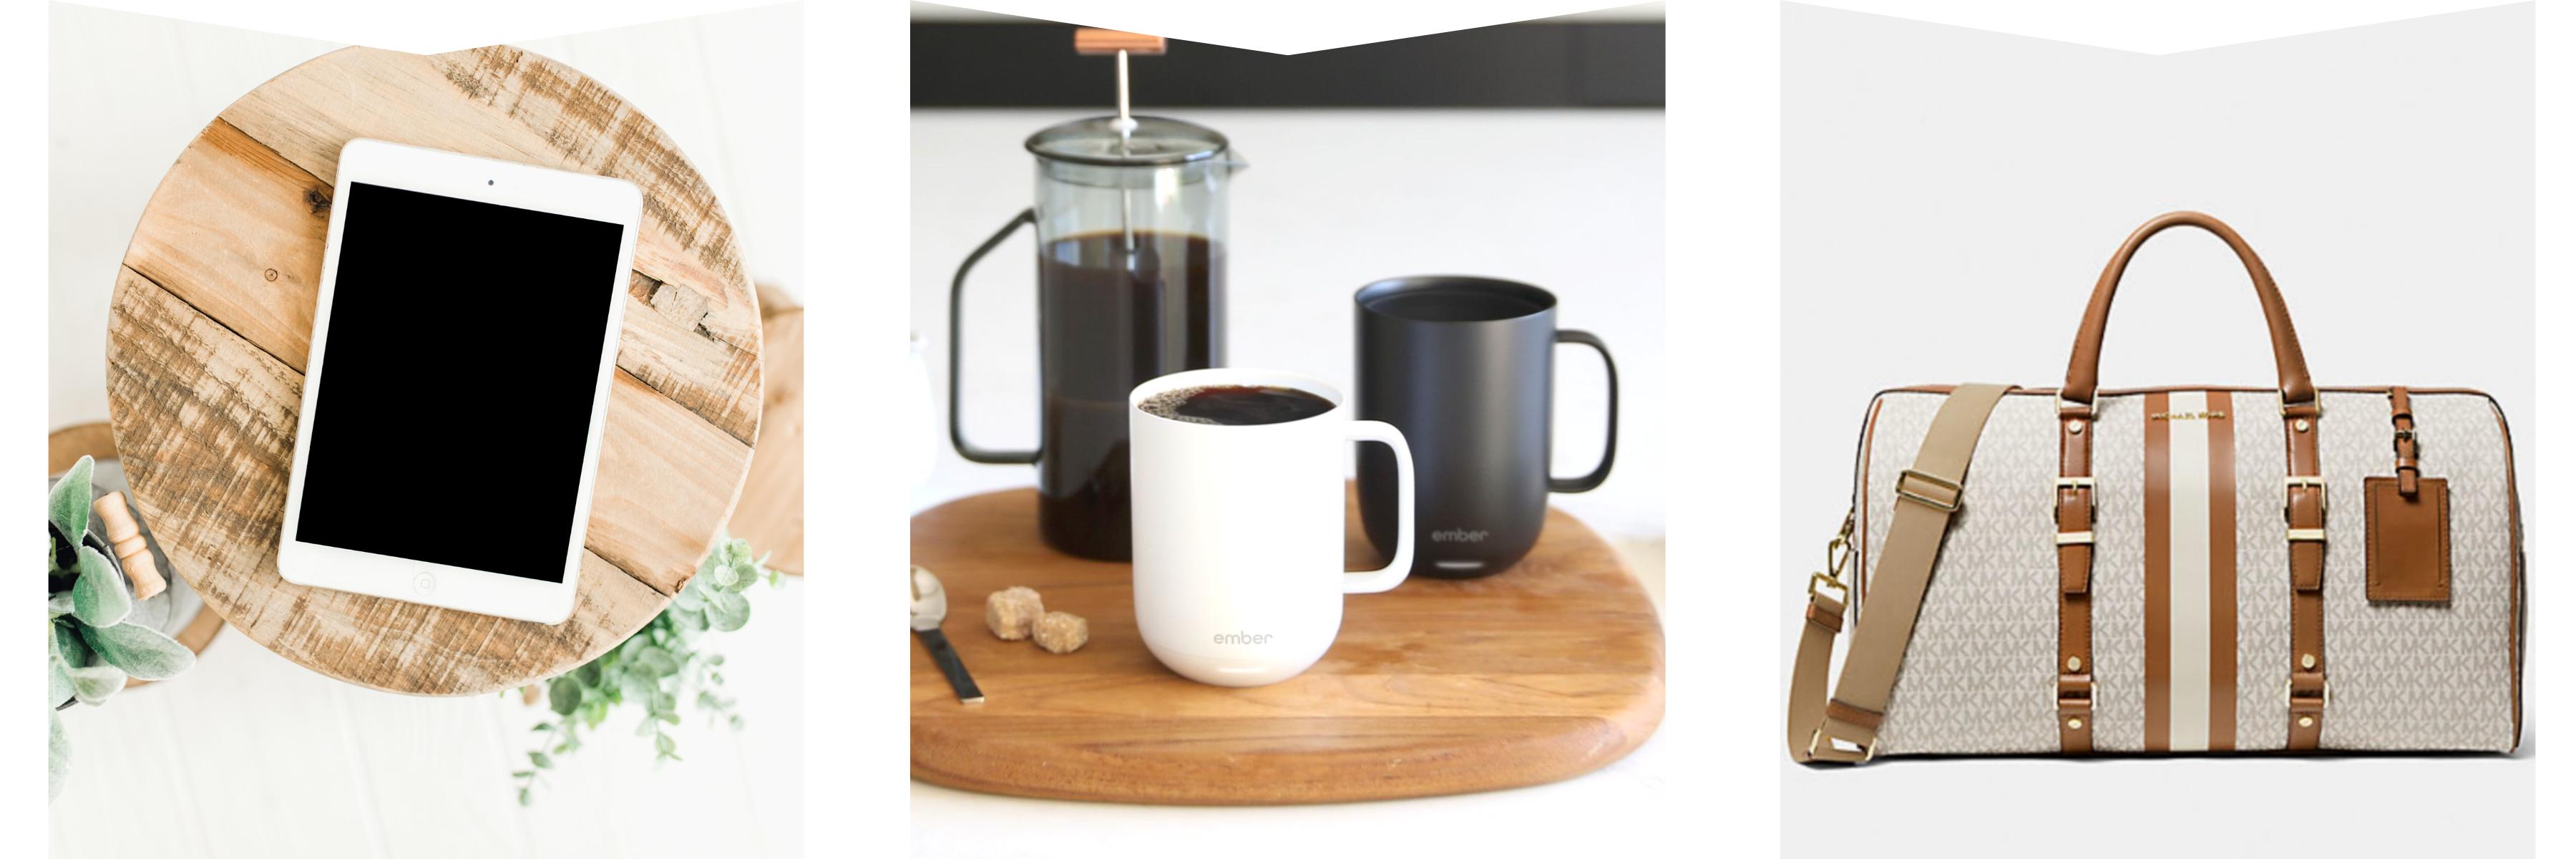 iPad, temperature control mug & Michael Kors duffle bag